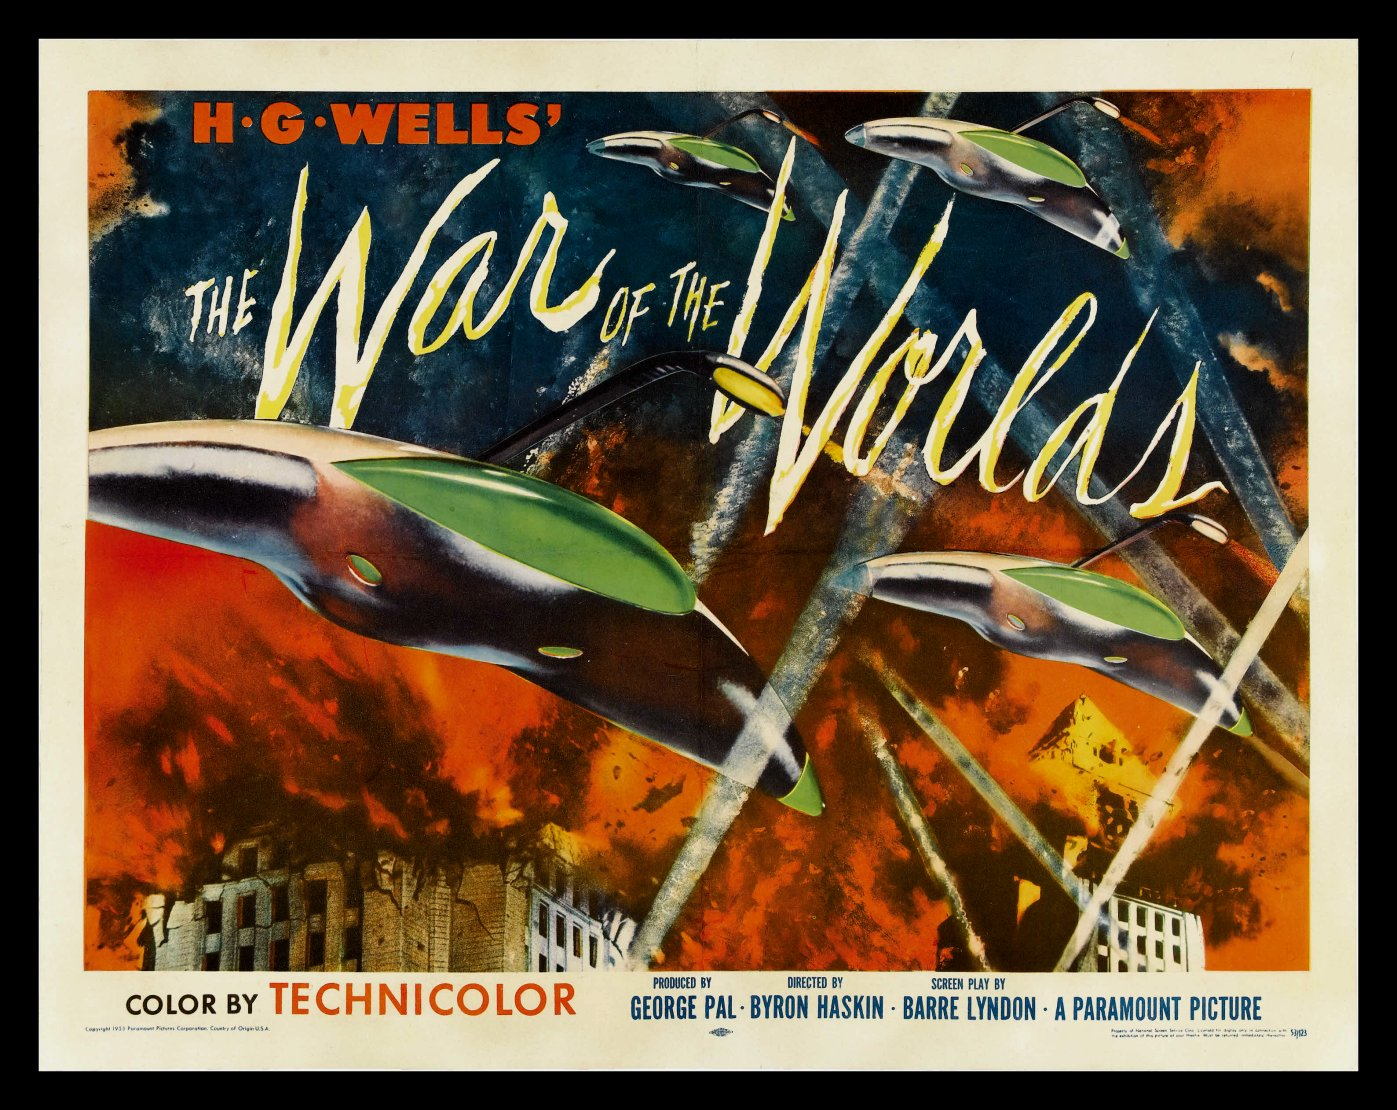 http://1.bp.blogspot.com/_93Y09YDcf0k/TKC3G19PKrI/AAAAAAAABg4/Ao2tGfPgi4I/s1600/War+of+the+Worlds.jpg